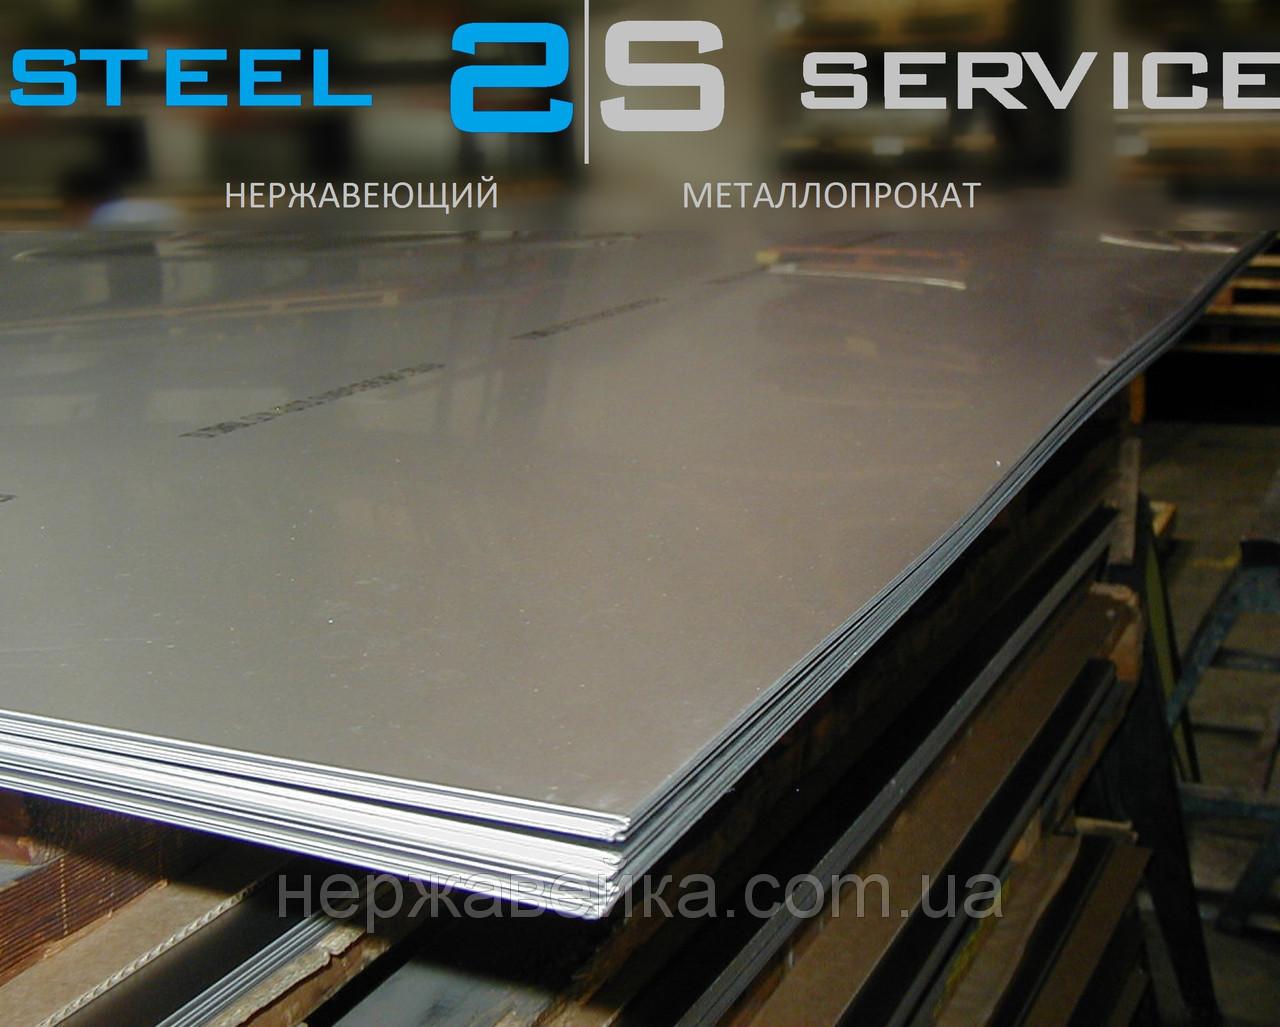 Нержавеющий лист 1х1500х3000мм  AISI 316L(03Х17Н14М3) 2B - матовый,  кислотостойкий